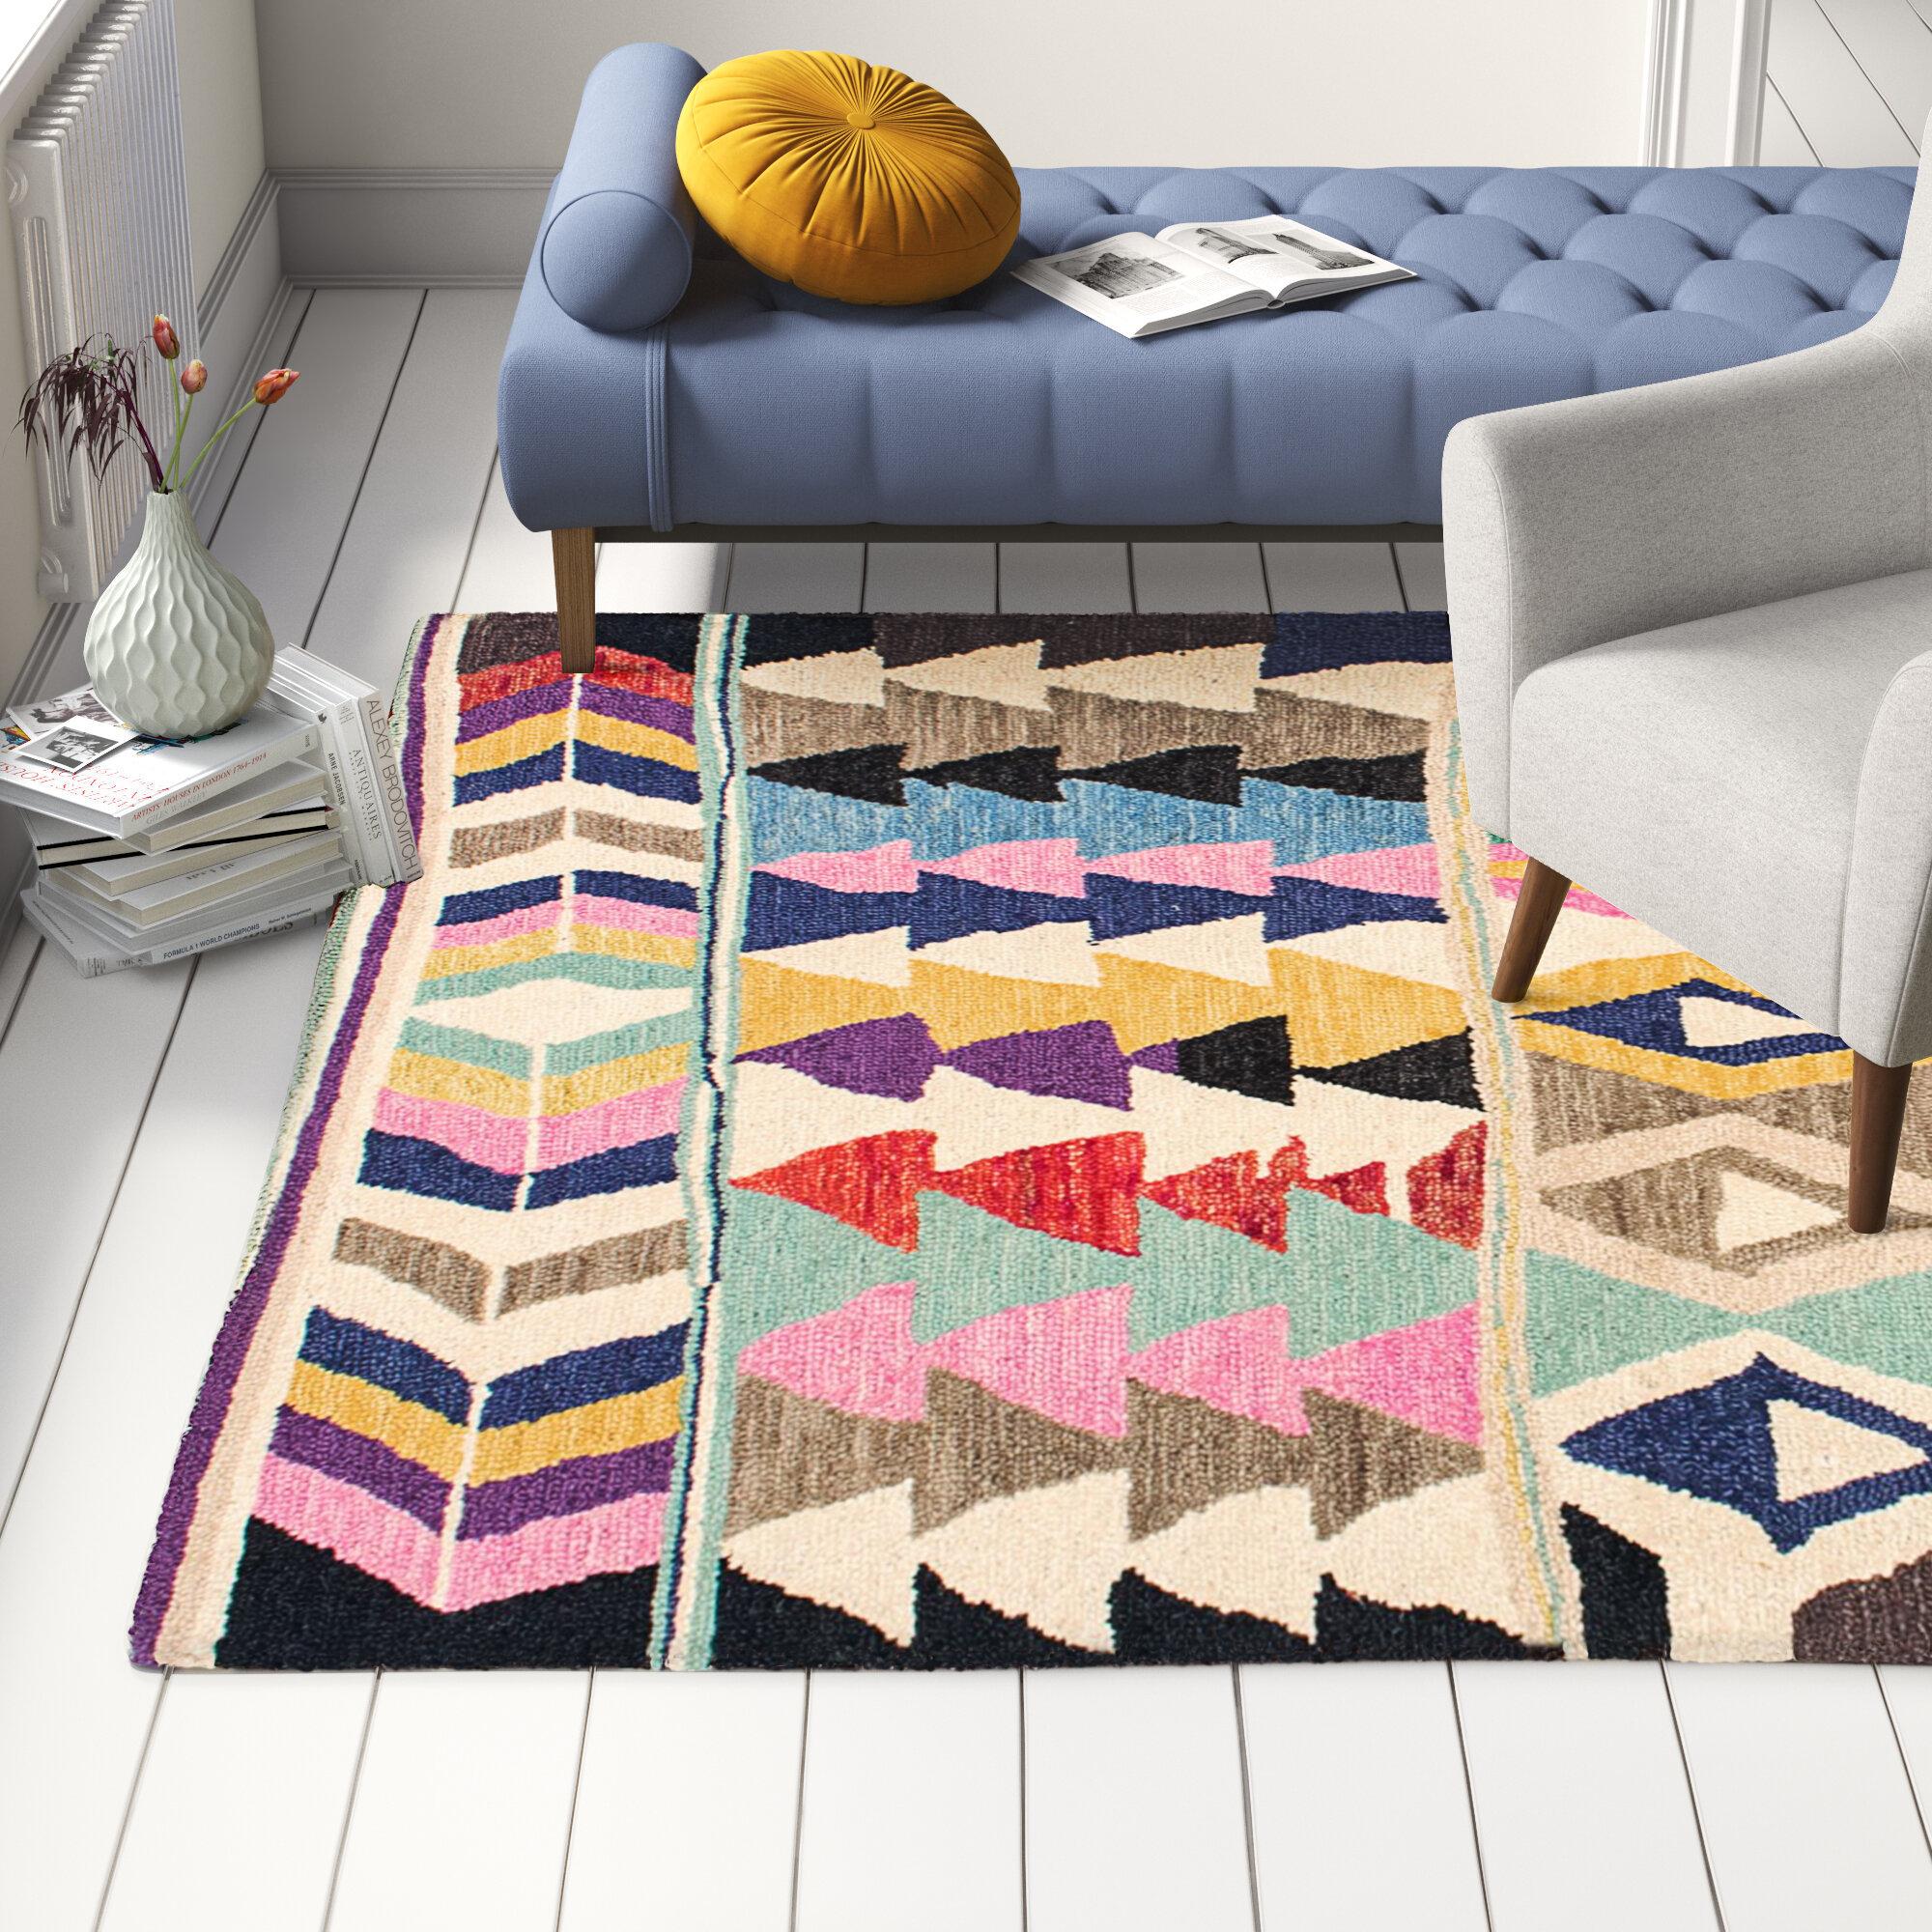 Baxley Tufted Wool Purple Area Rug Reviews Allmodern